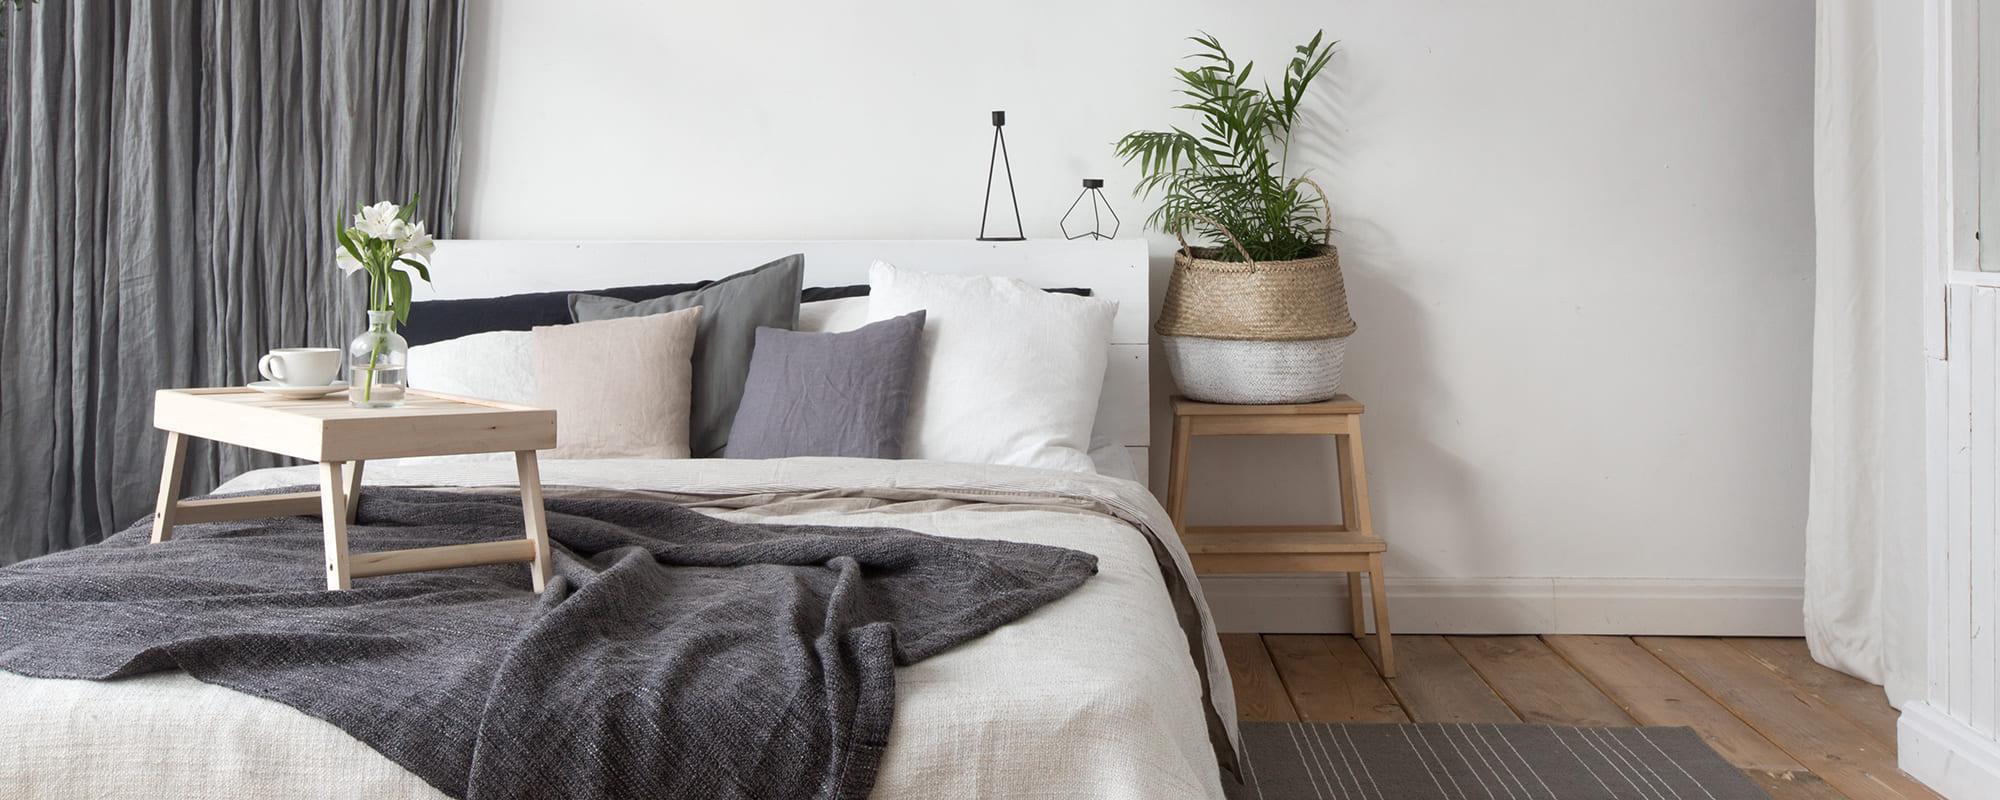 Schimmel in de slaapkamer